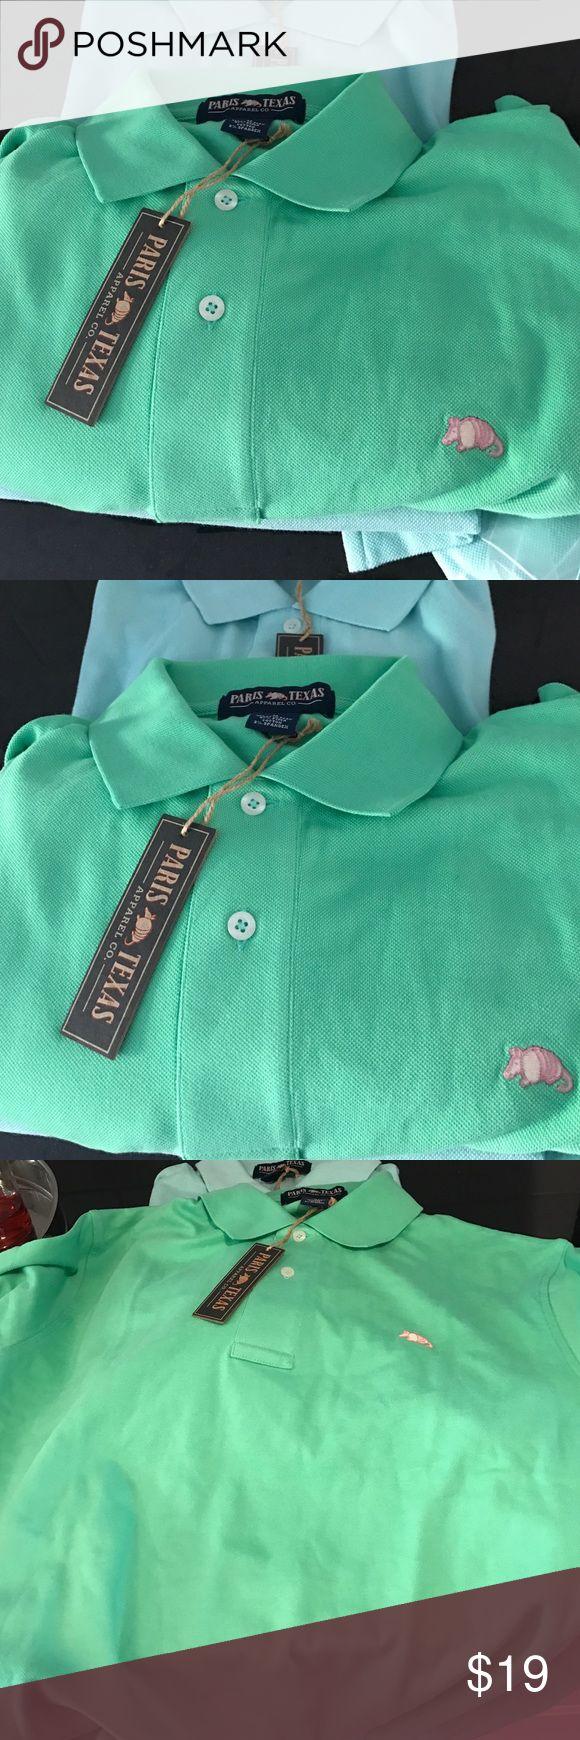 Paris Texas shirt brand new men's shirt Green size medium. New with tags! Men's shirt! paris texas Tops